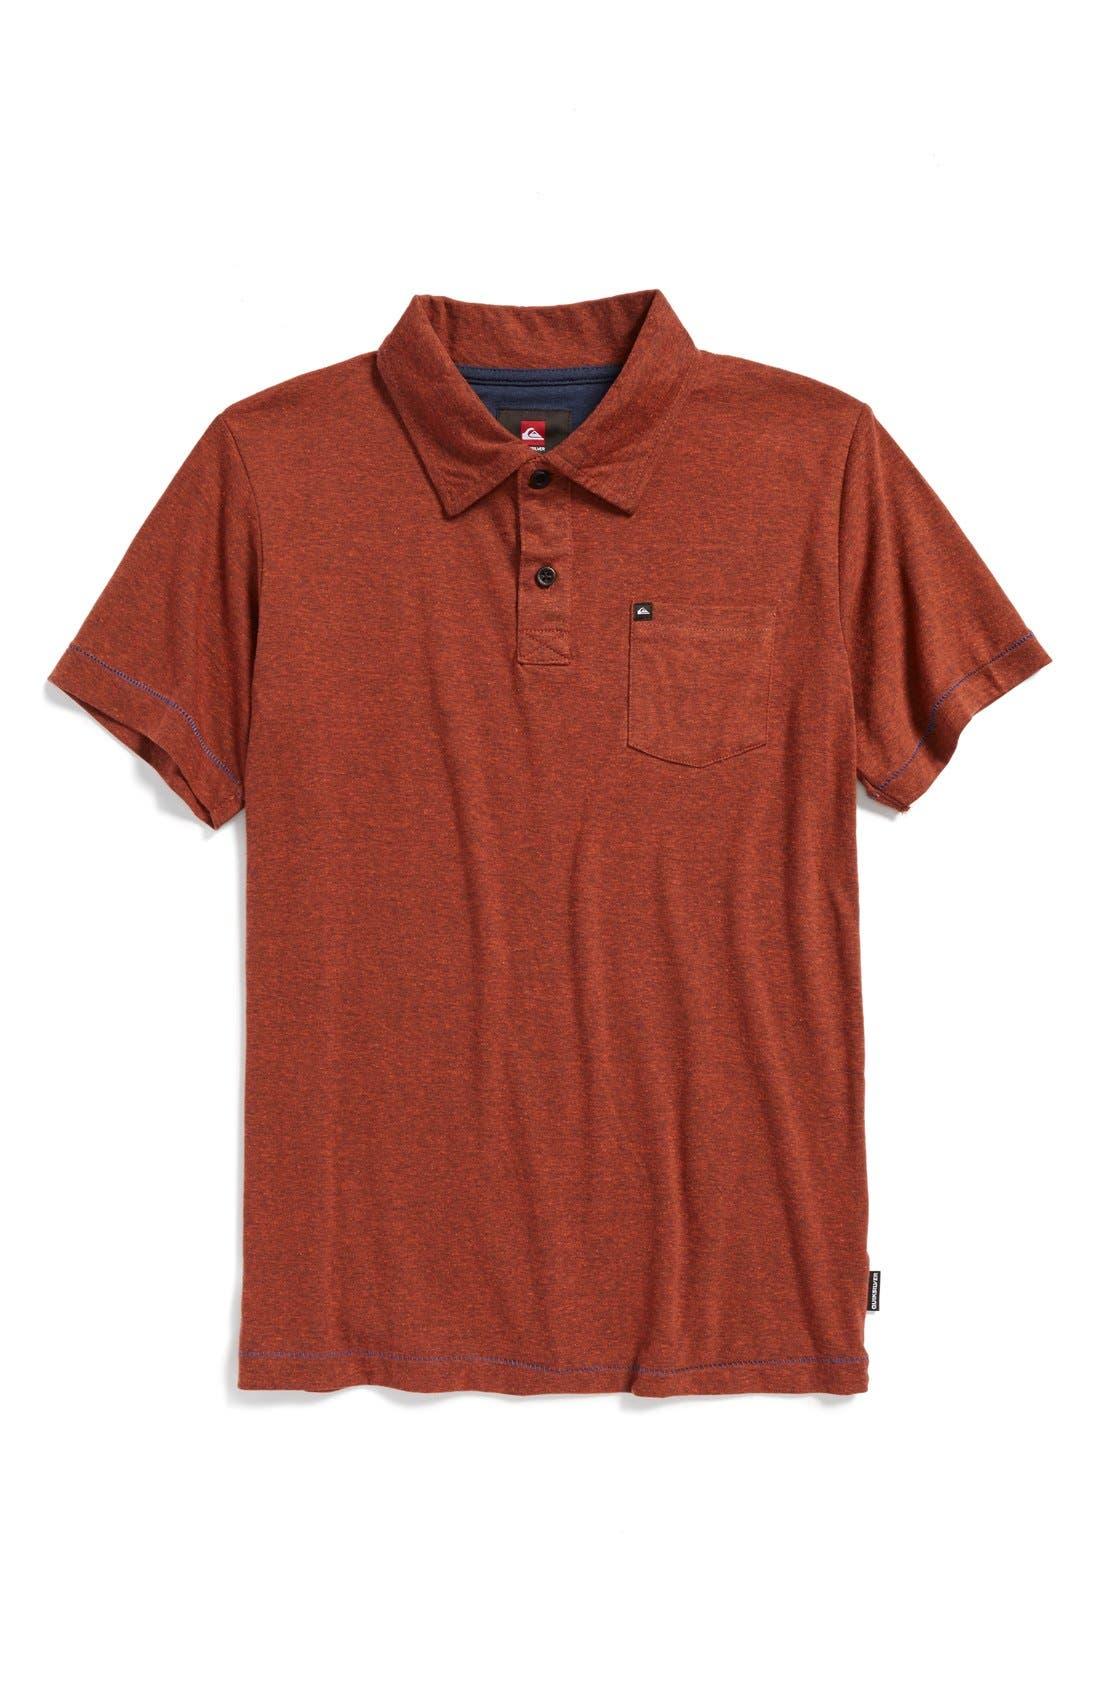 Main Image - Quiksilver 'Core' Cotton Blend Jersey Polo (Big Boys)